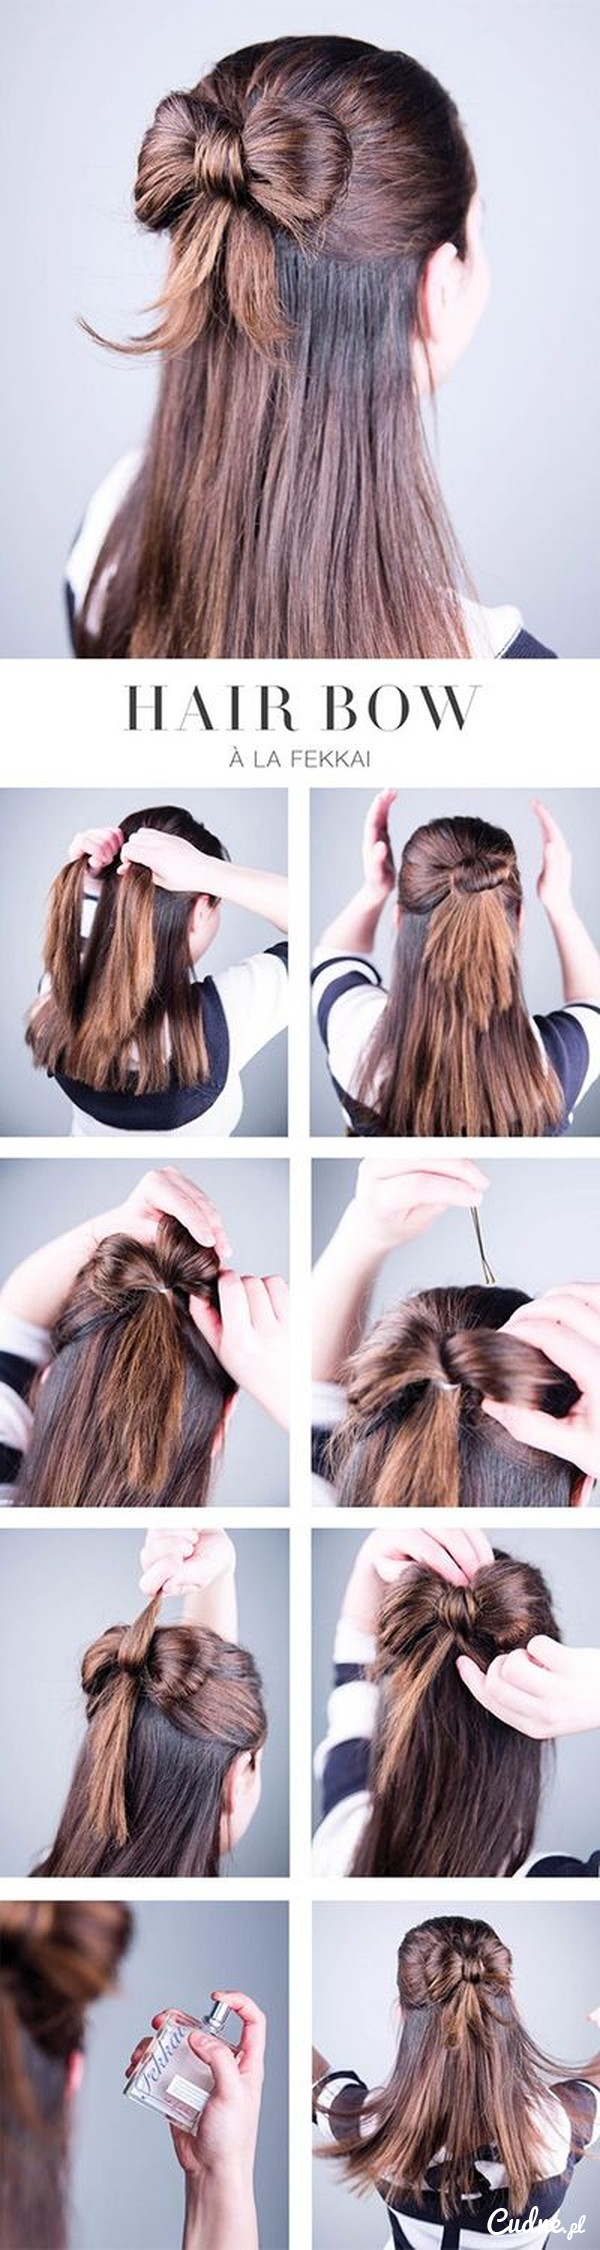 Kokarda z włosów peinados pinterest hair style easy